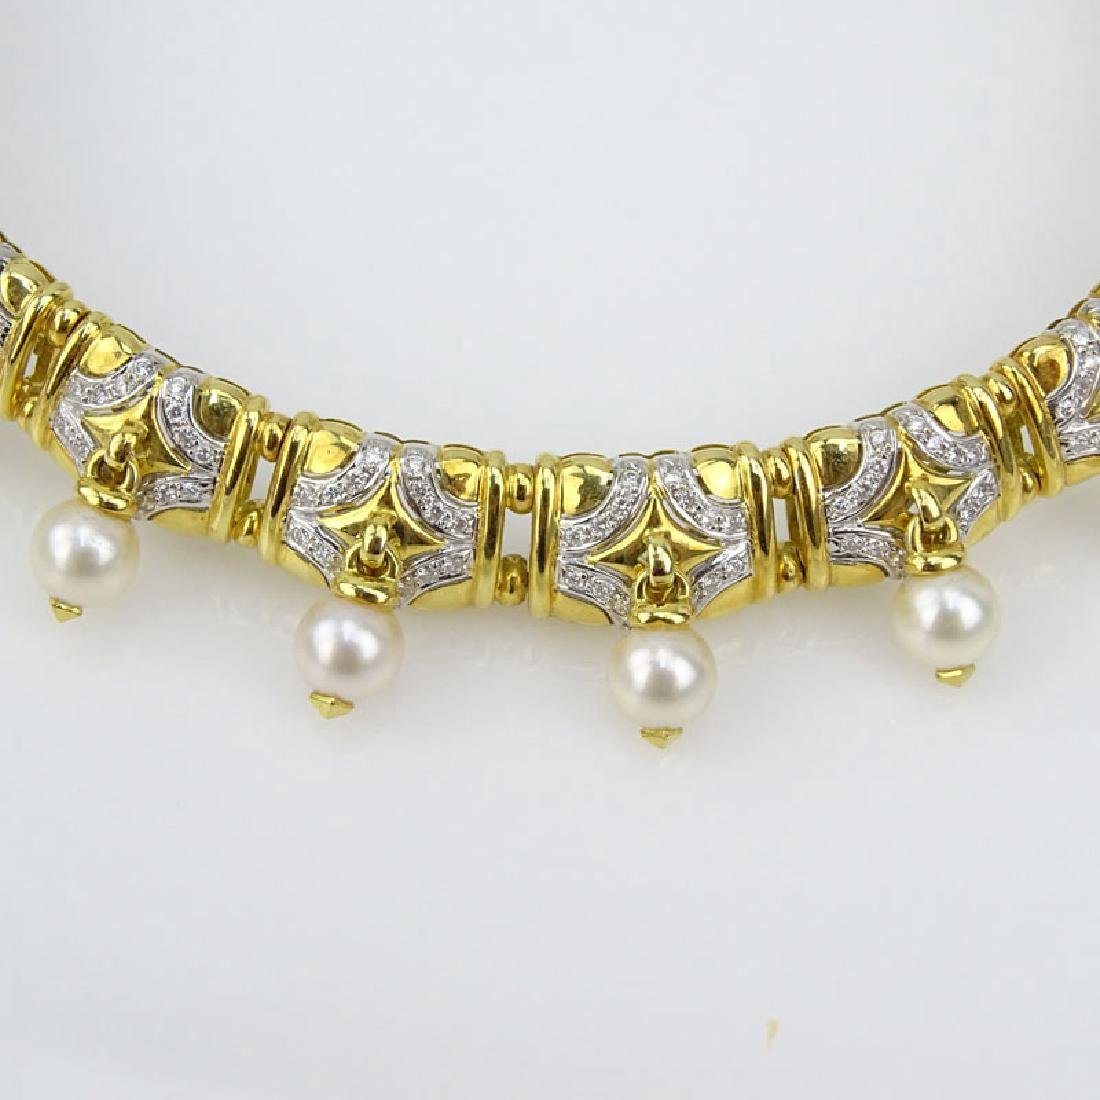 Vintage Bulgari style Heavy 18 Karat Yellow Gold, Pave - 2